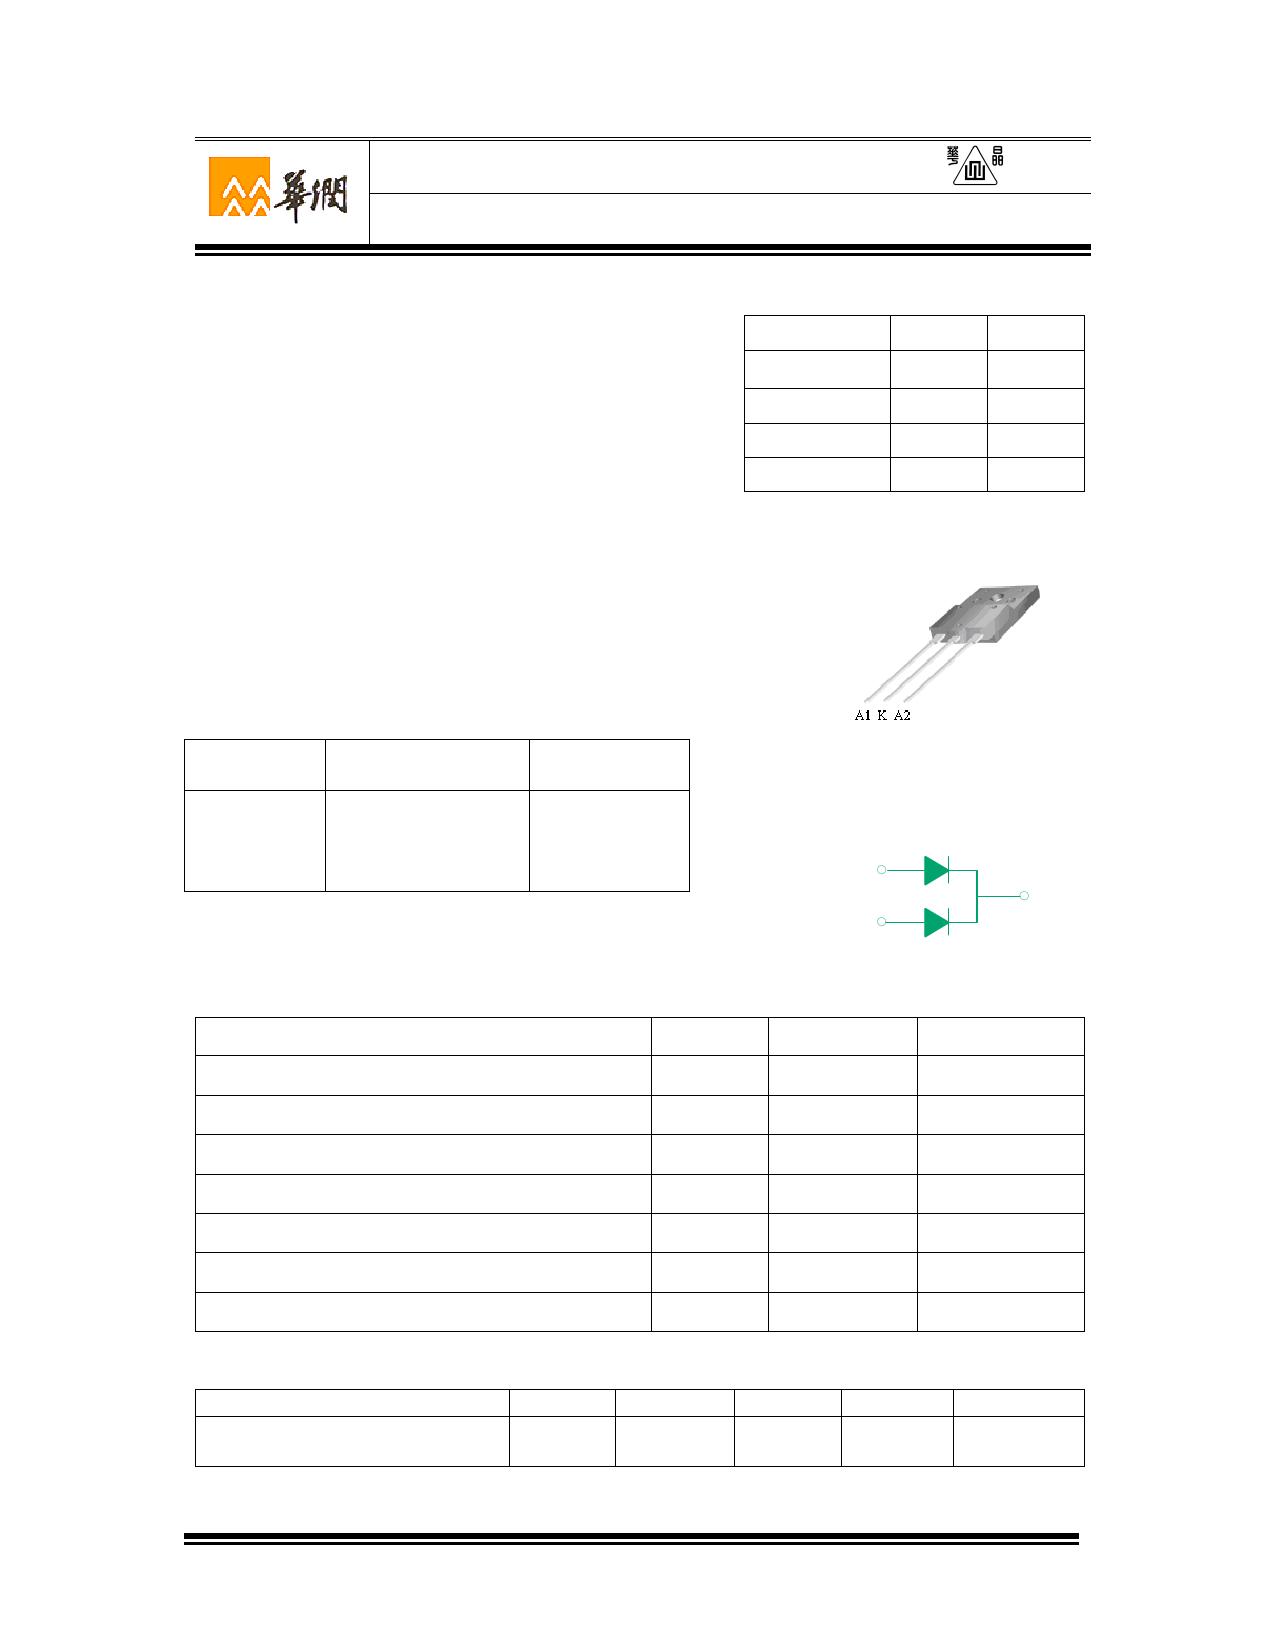 2CR204AHS Datasheet, 2CR204AHS PDF,ピン配置, 機能